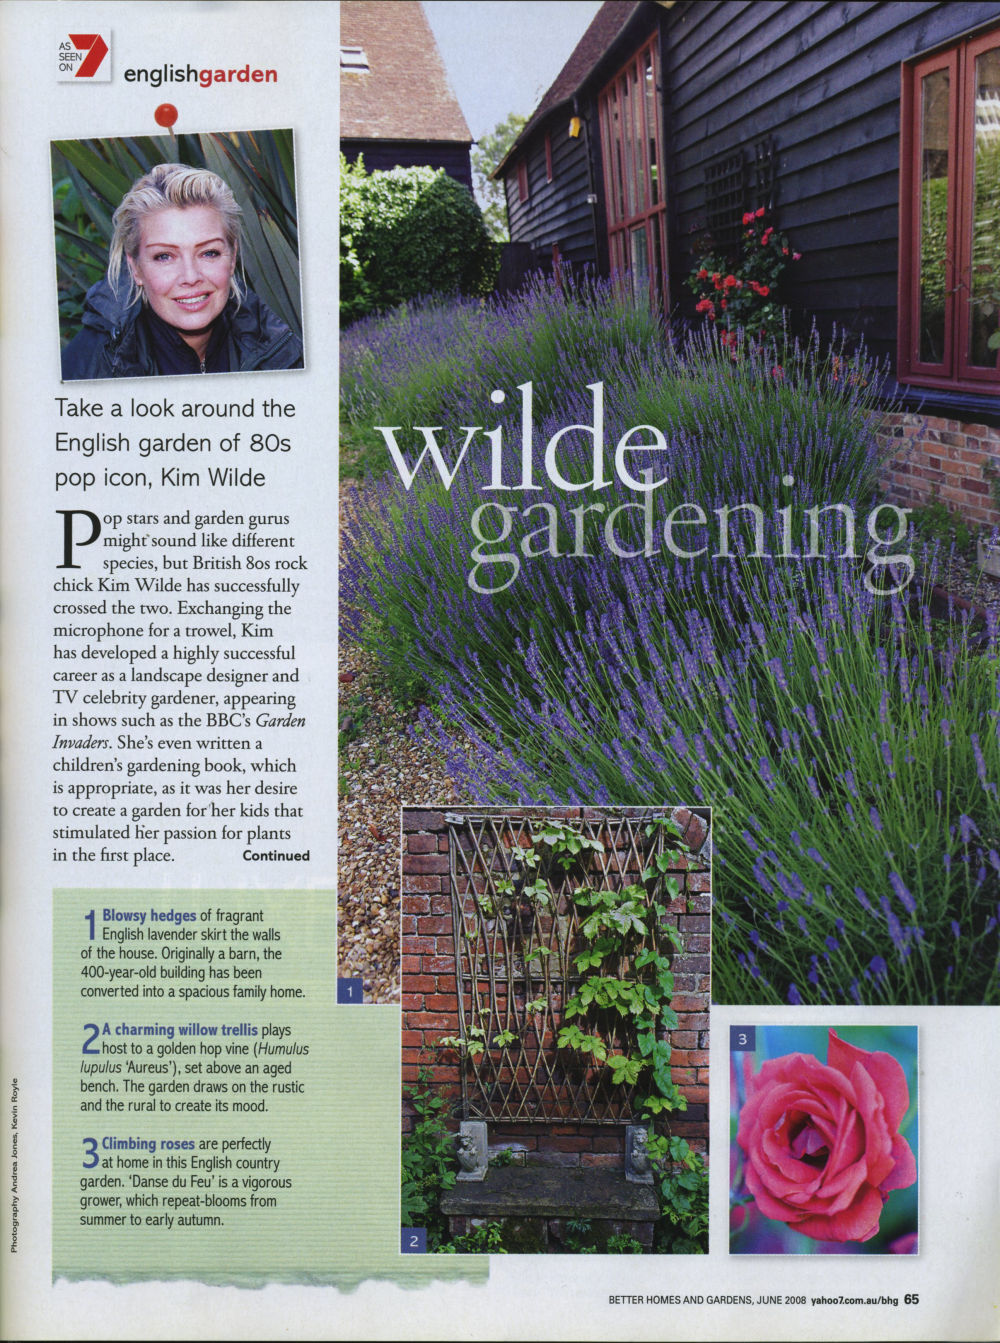 better homes and gardens uk june 2008 - Wilde Garden